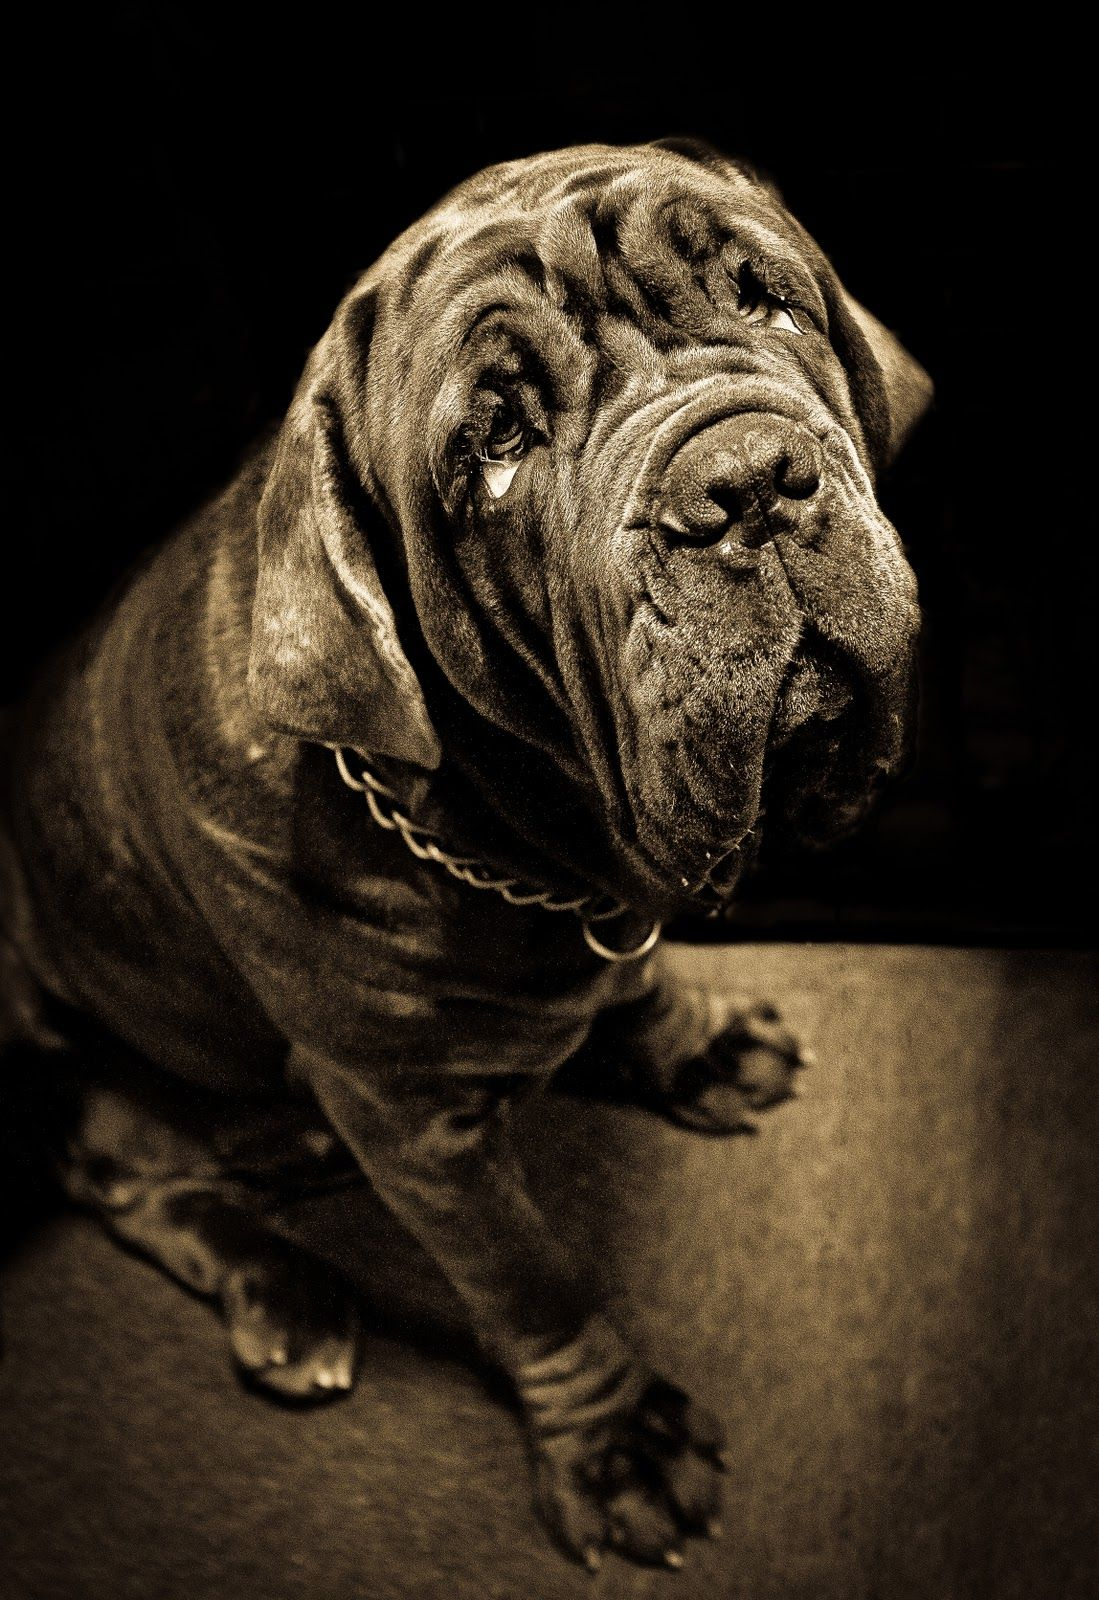 #Neopolitan #Mastiff Those eyes!!!!   Animal Goodness ...